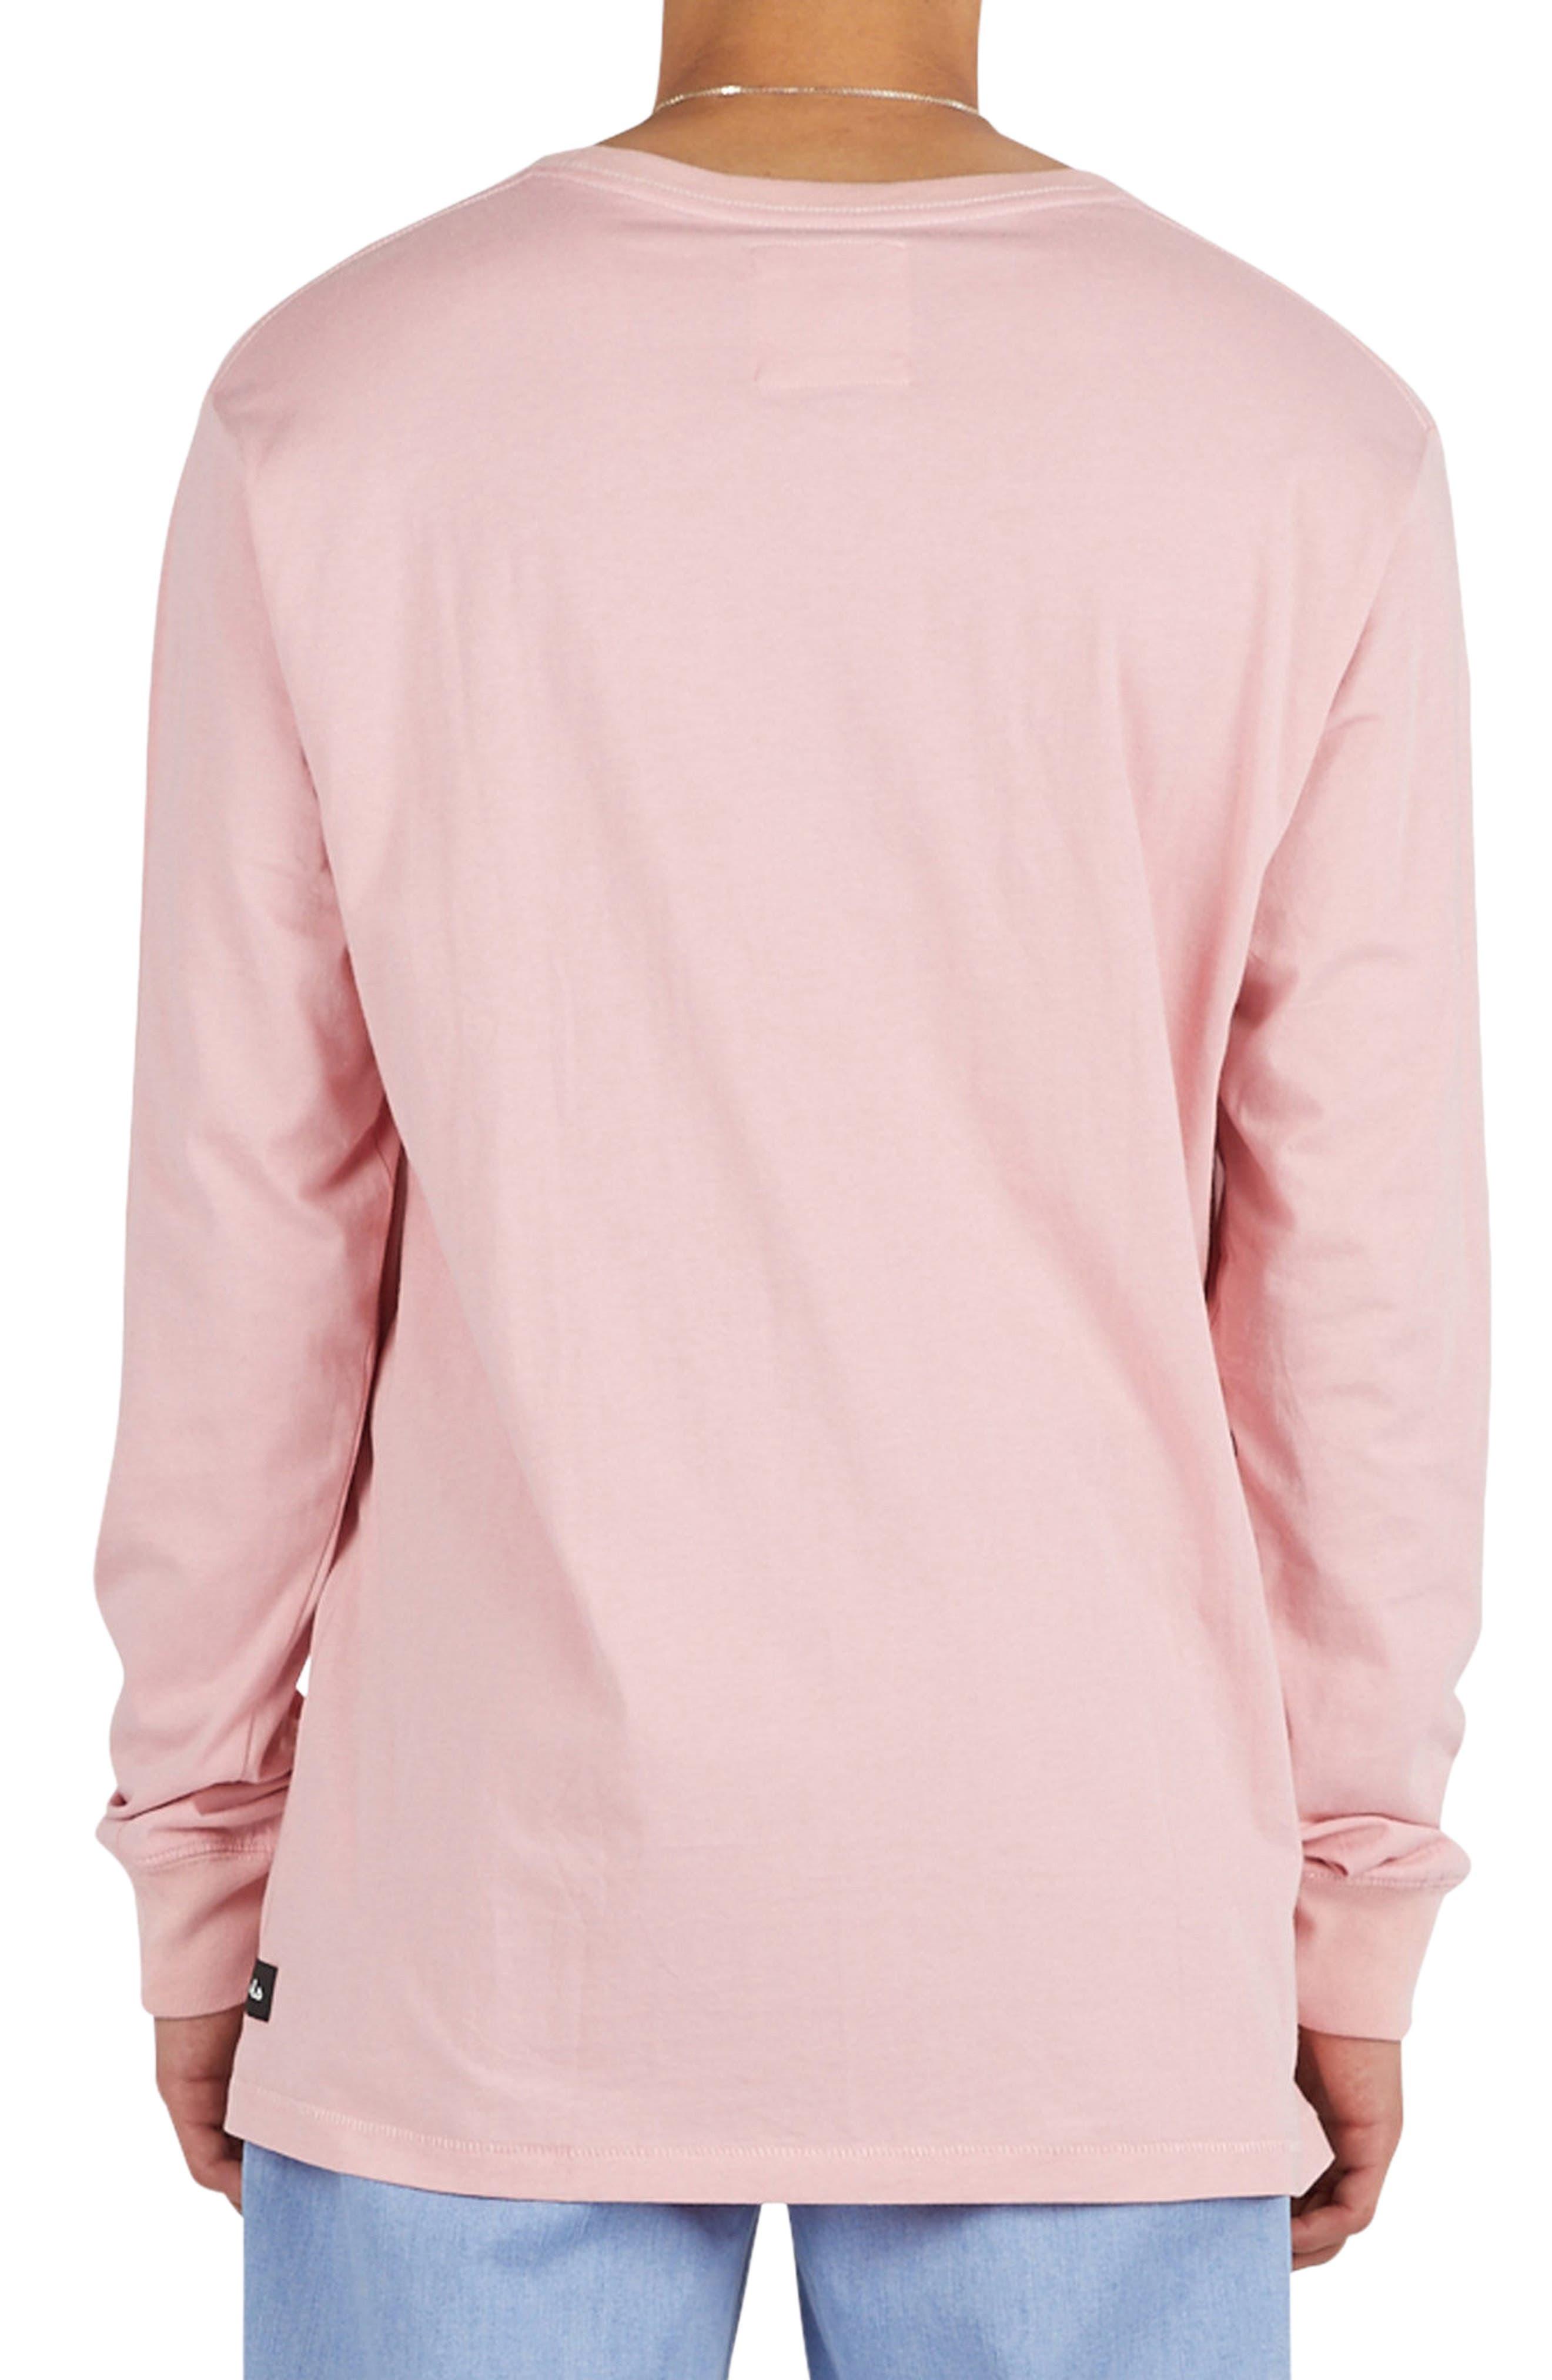 Pink Animals Long Sleeve T-Shirt,                             Alternate thumbnail 2, color,                             Pink Animals